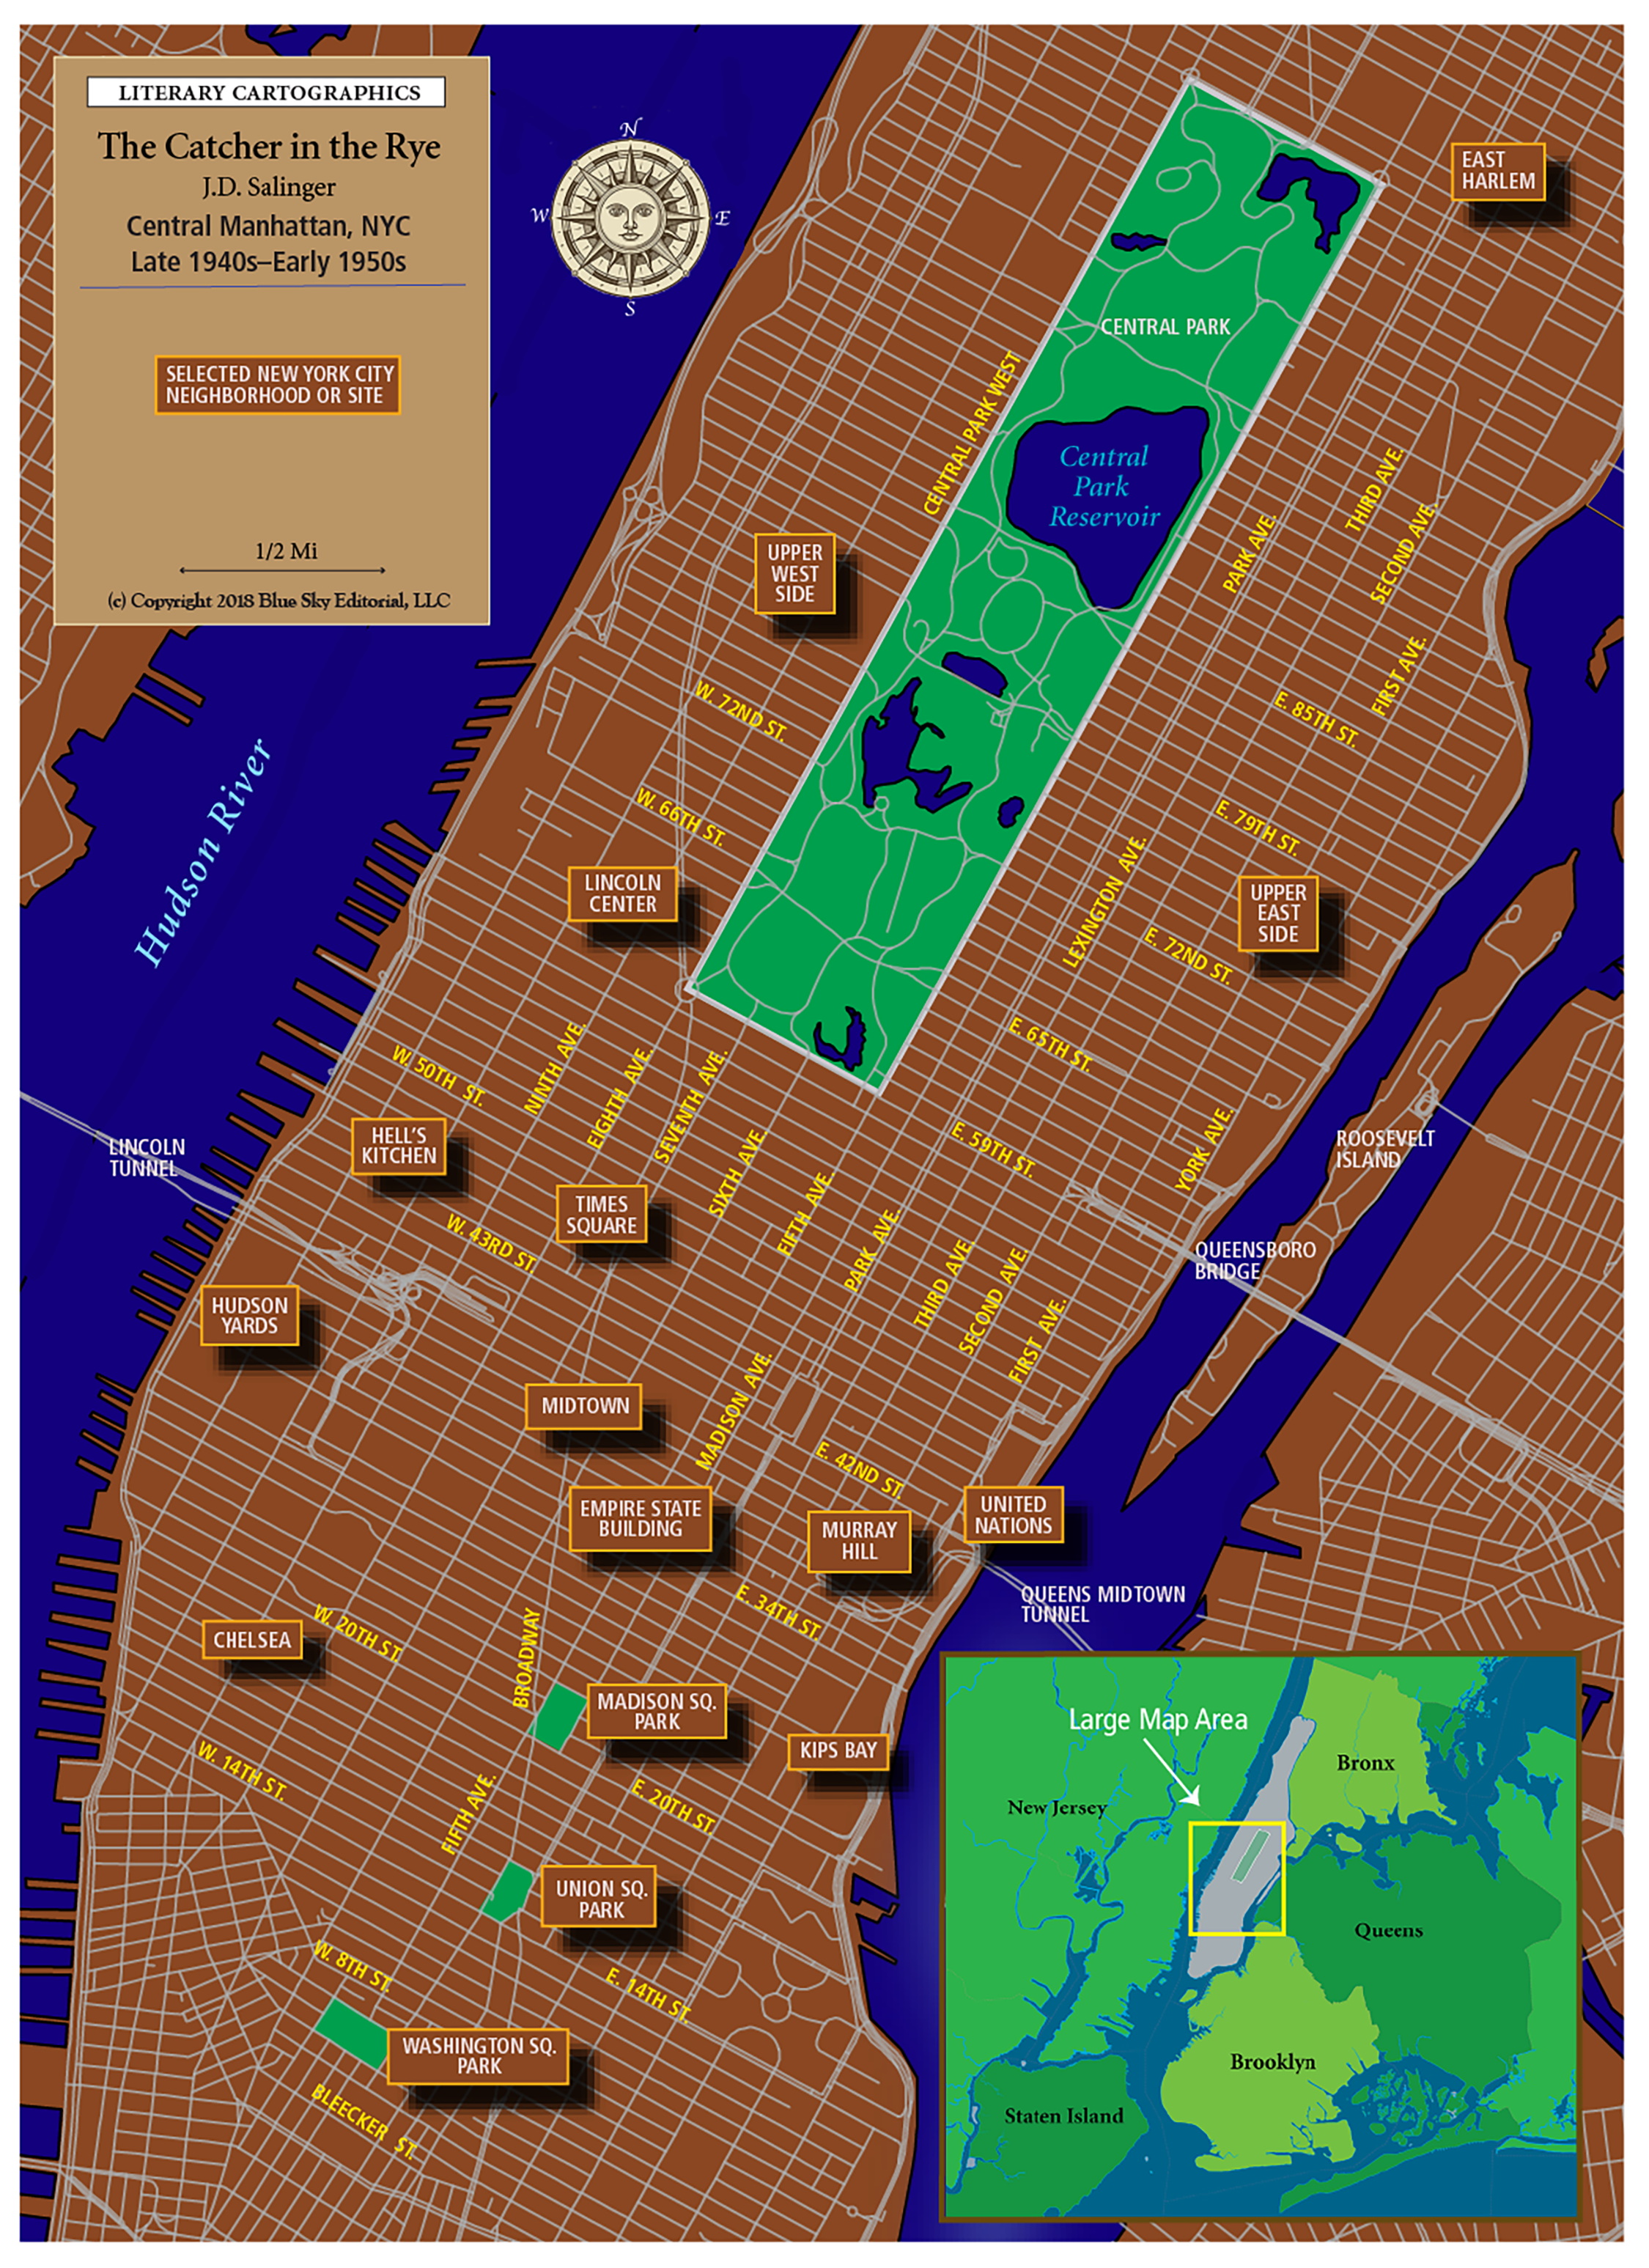 https://s3.amazonaws.com/bucket3grapes/Catcher+base+map8